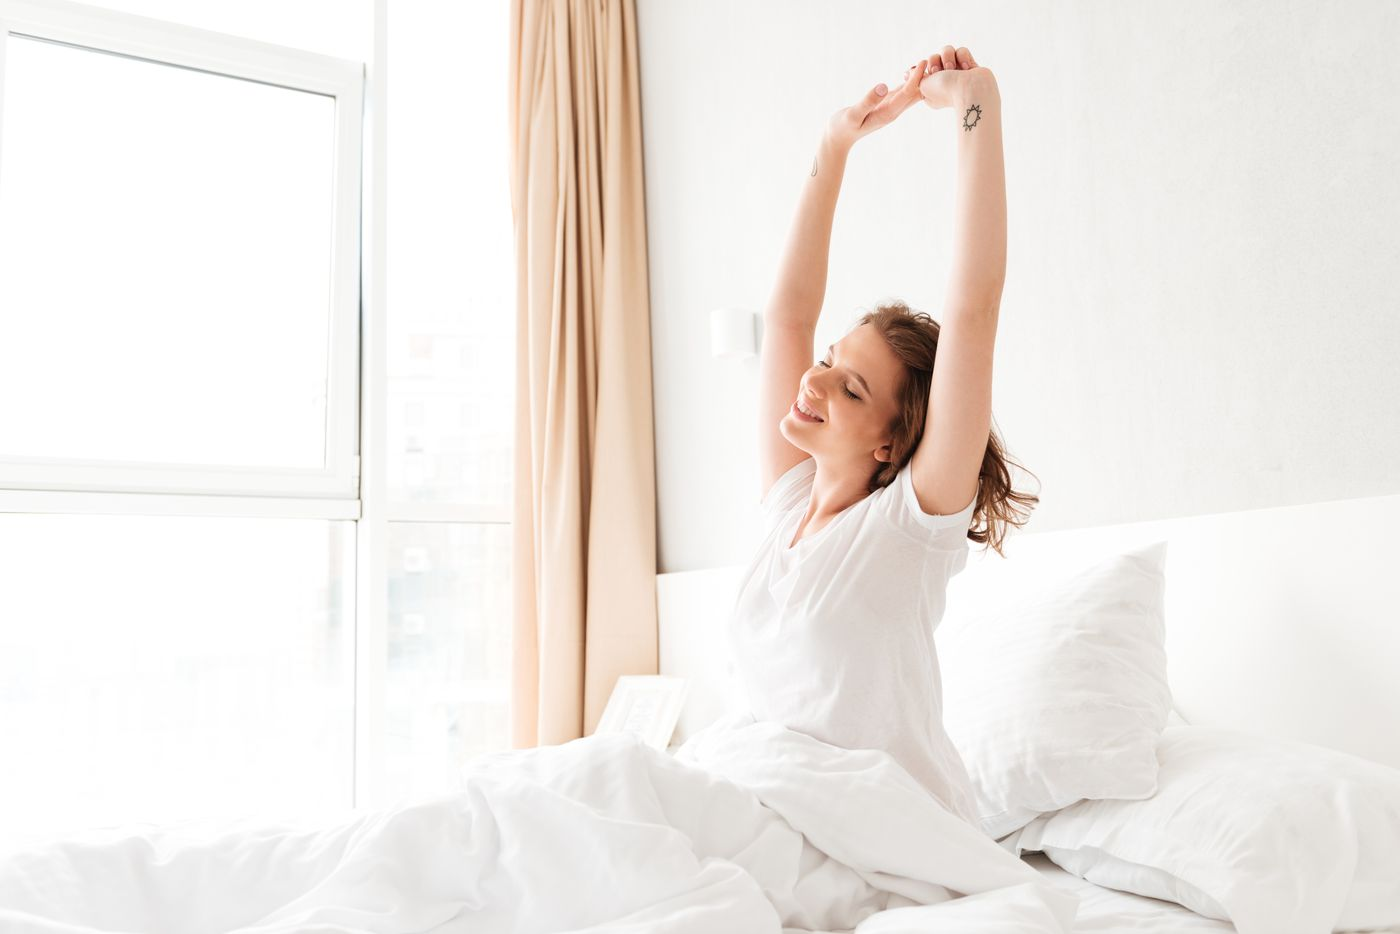 Dormire tranquili con le finestre antirumore